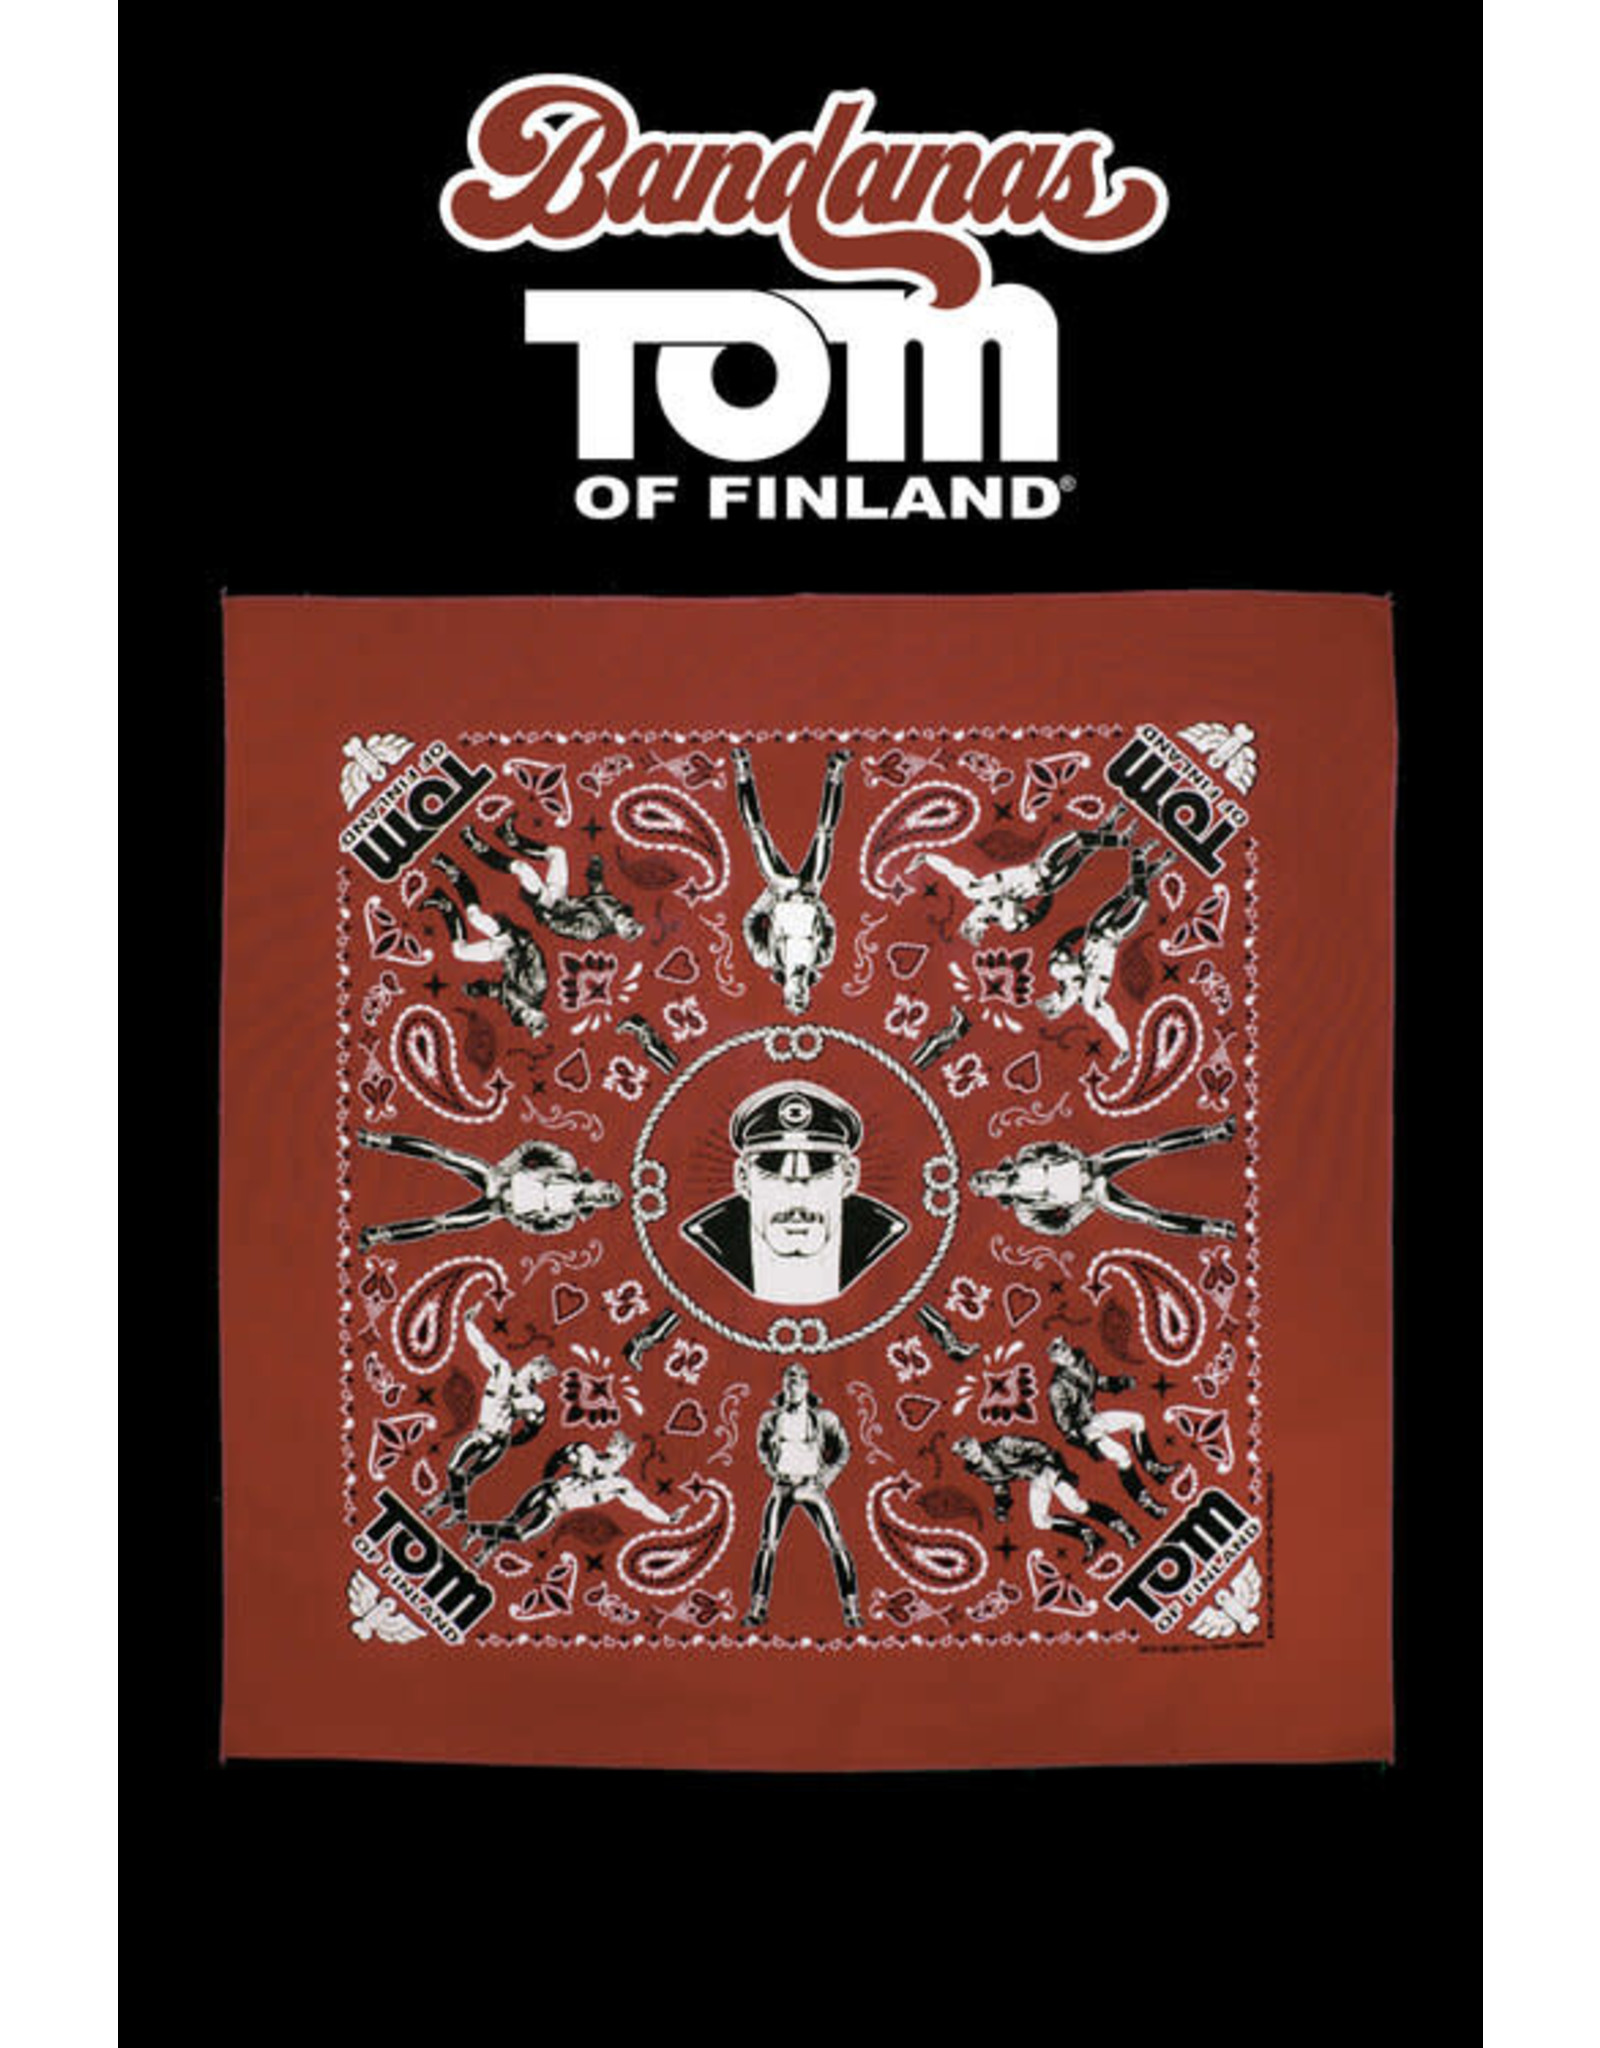 Peachy Kings Tom of Finland Bandanna